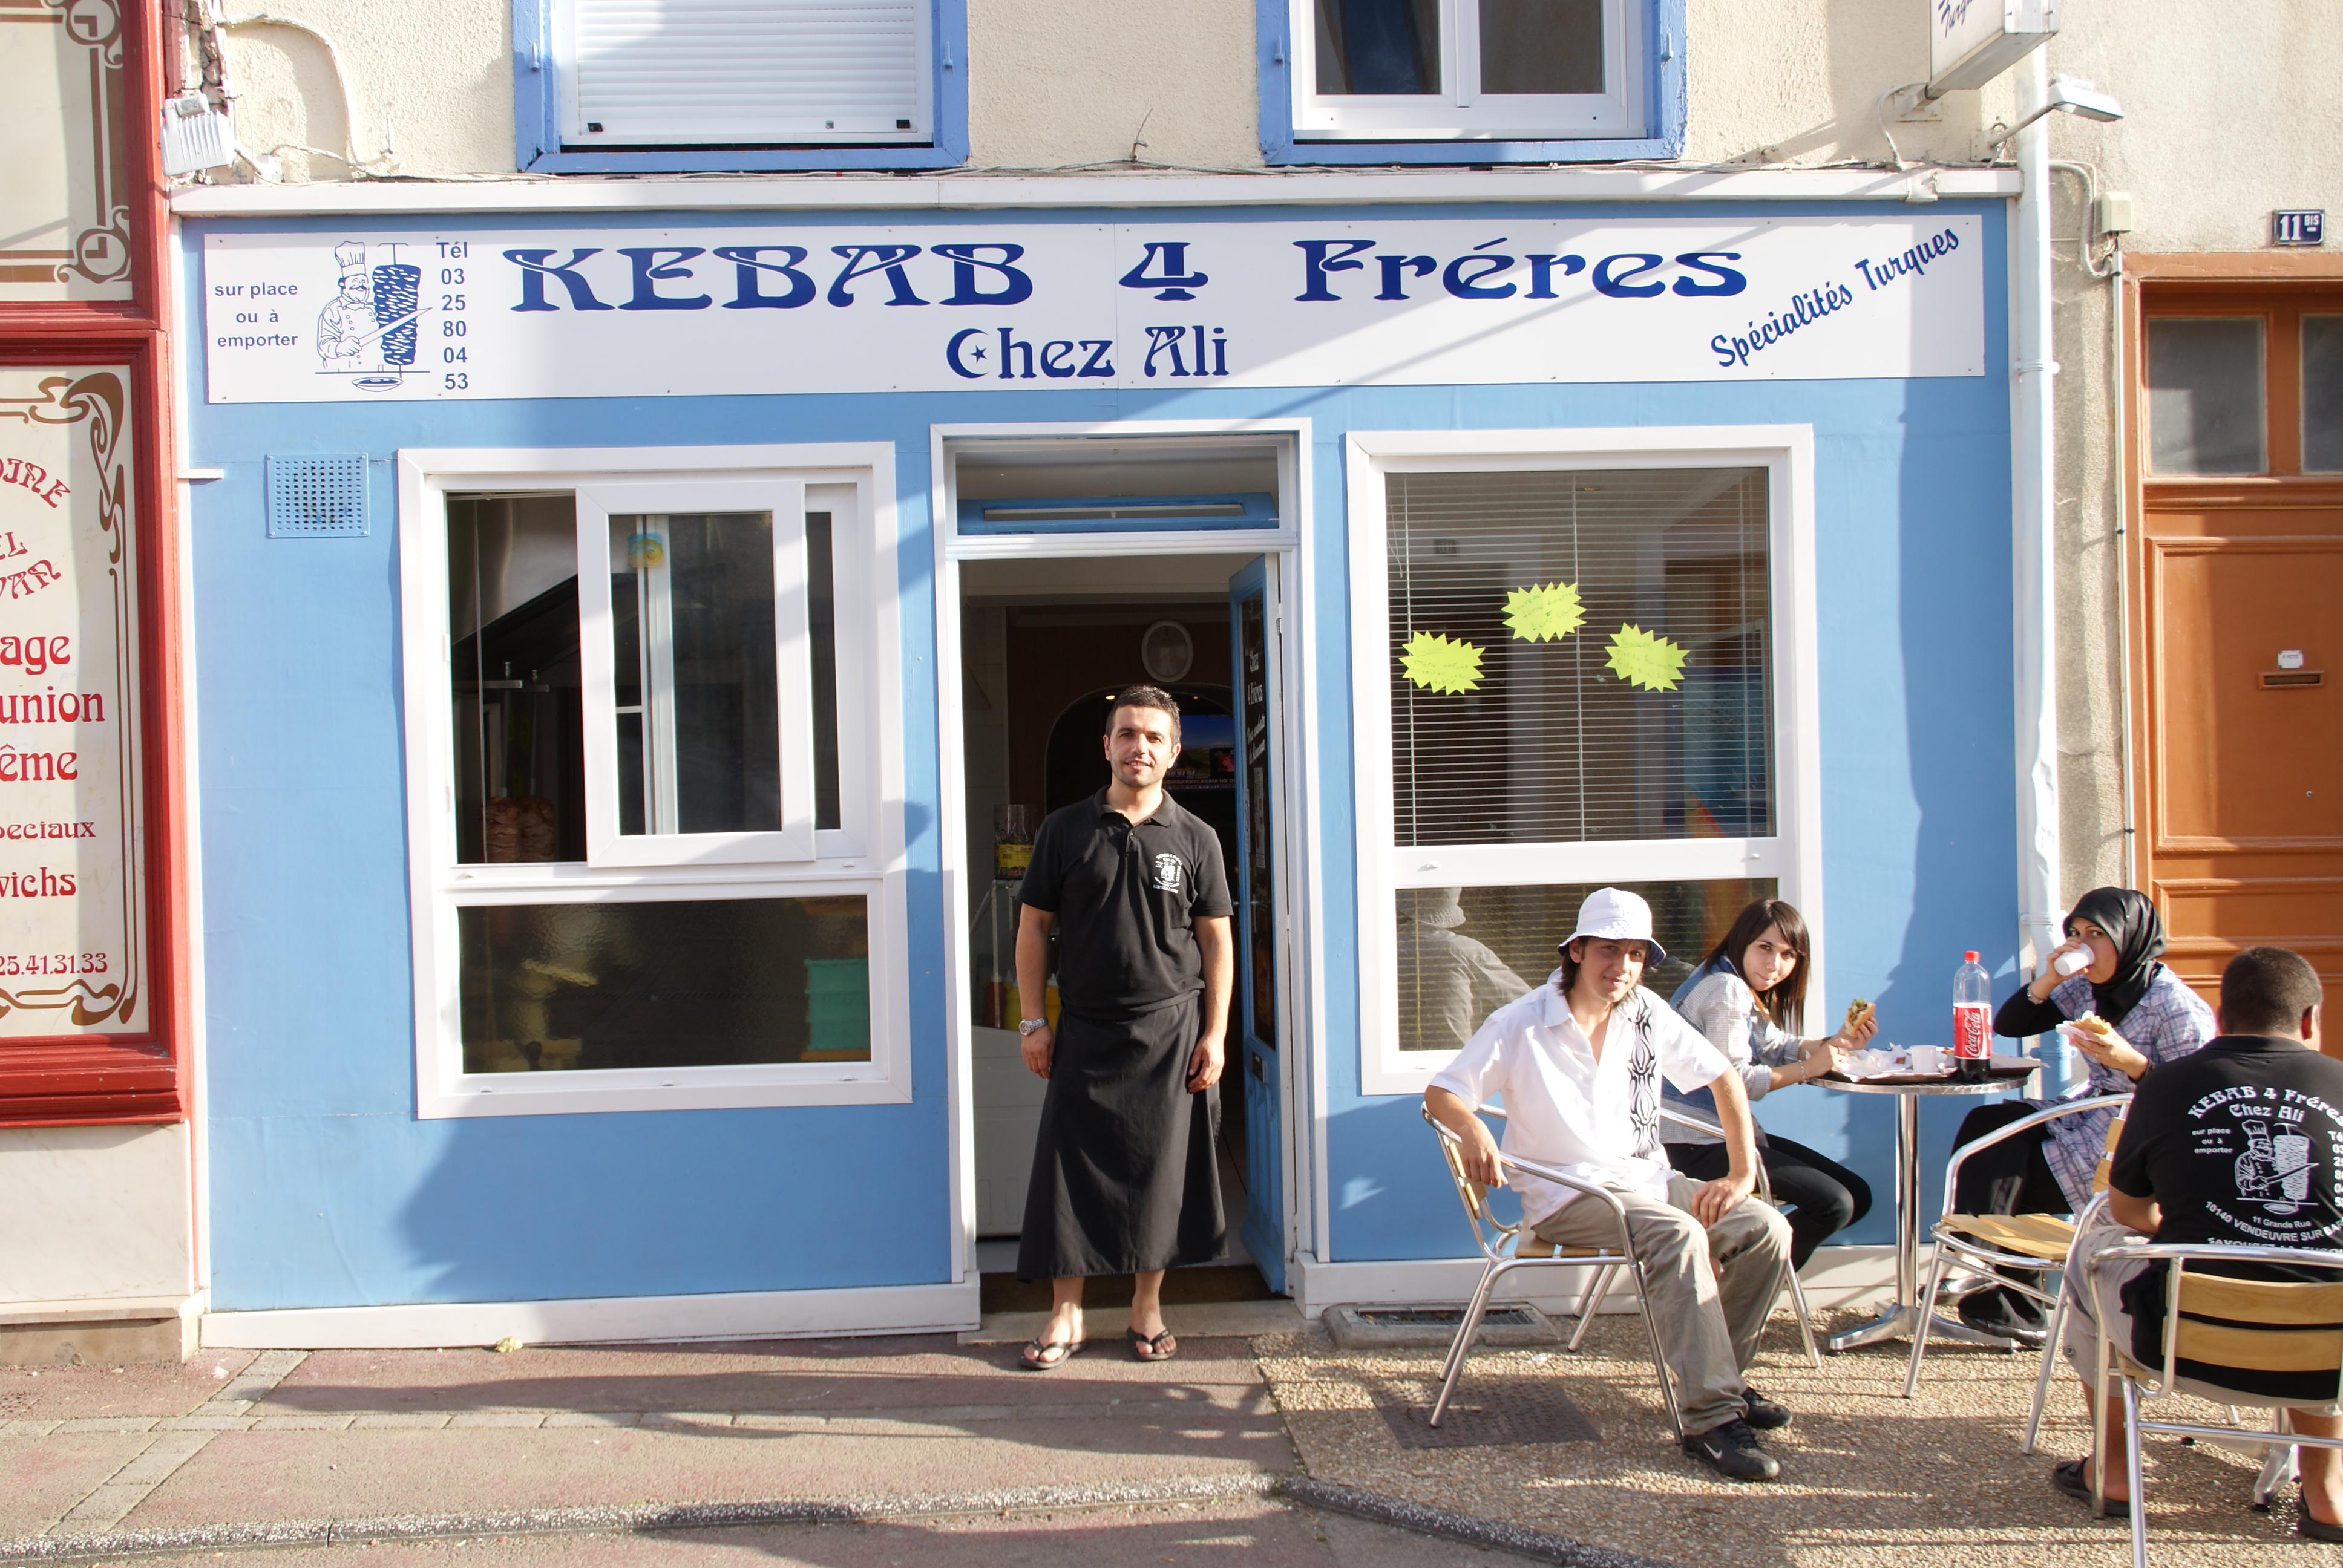 Kebab 4 freres Chez Ali